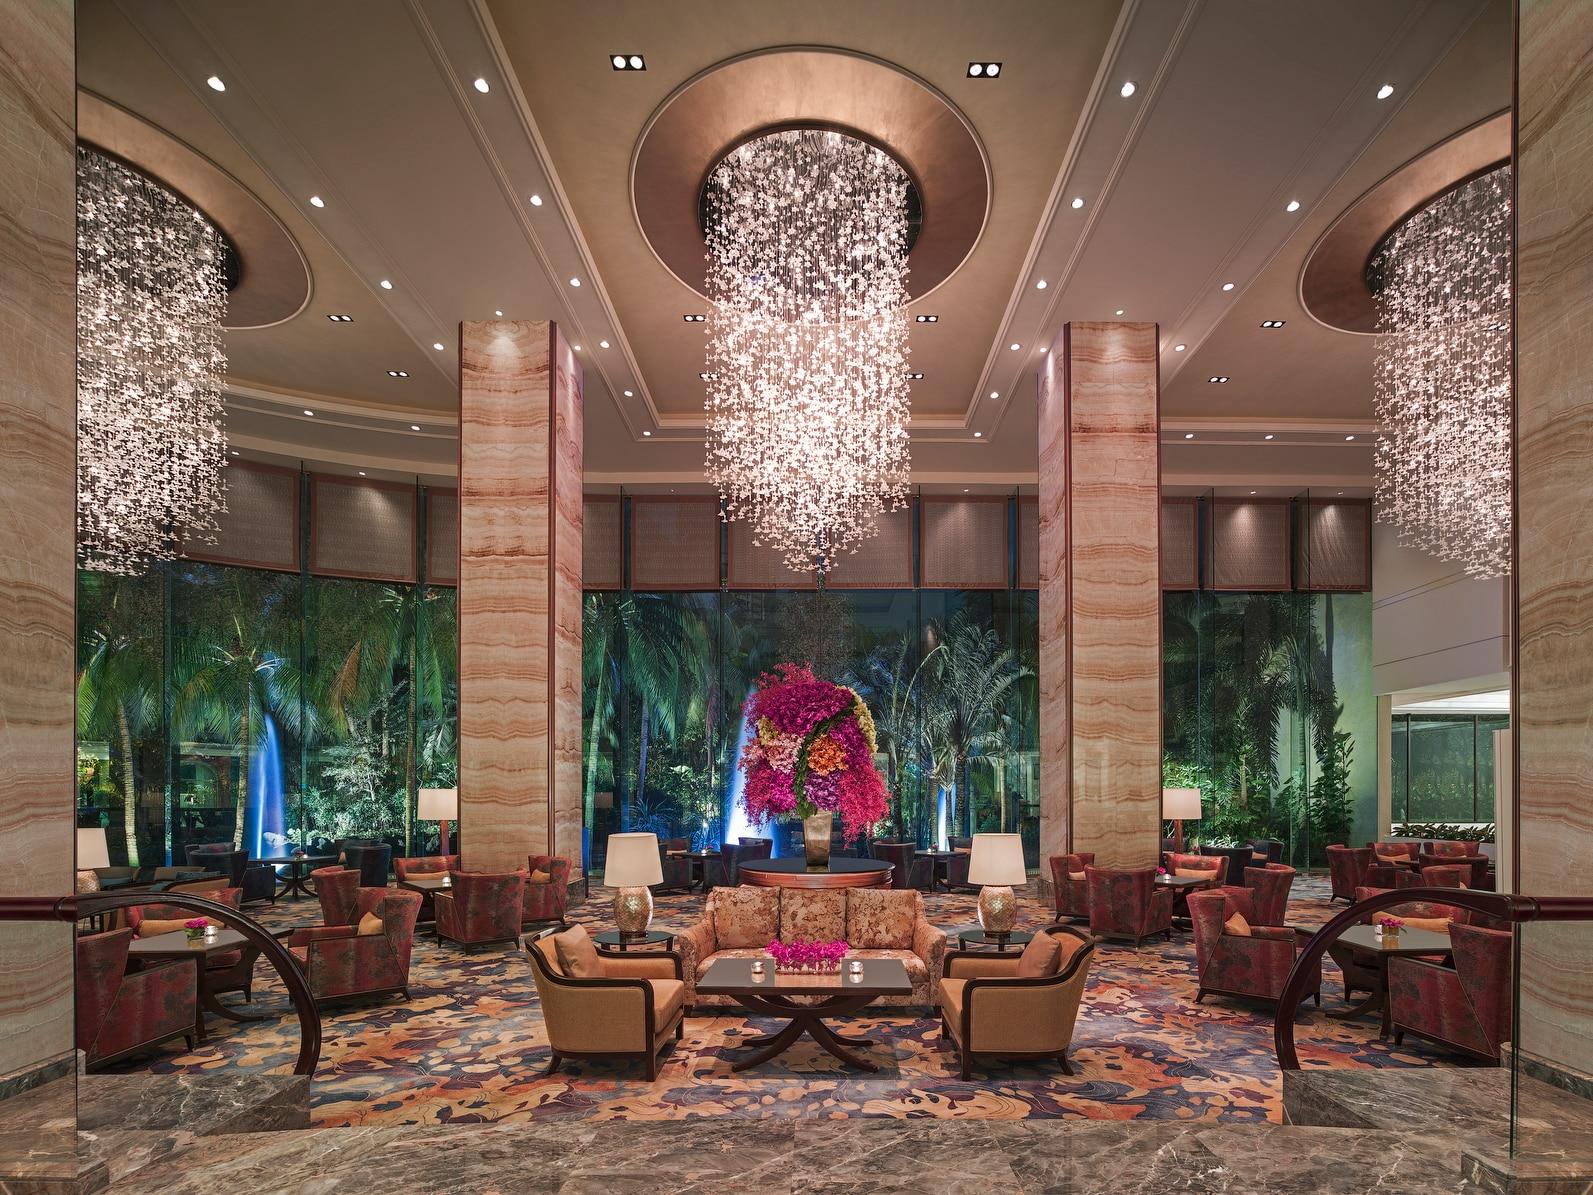 Lobby and lounge area of EDSA Shangri-la Hotel